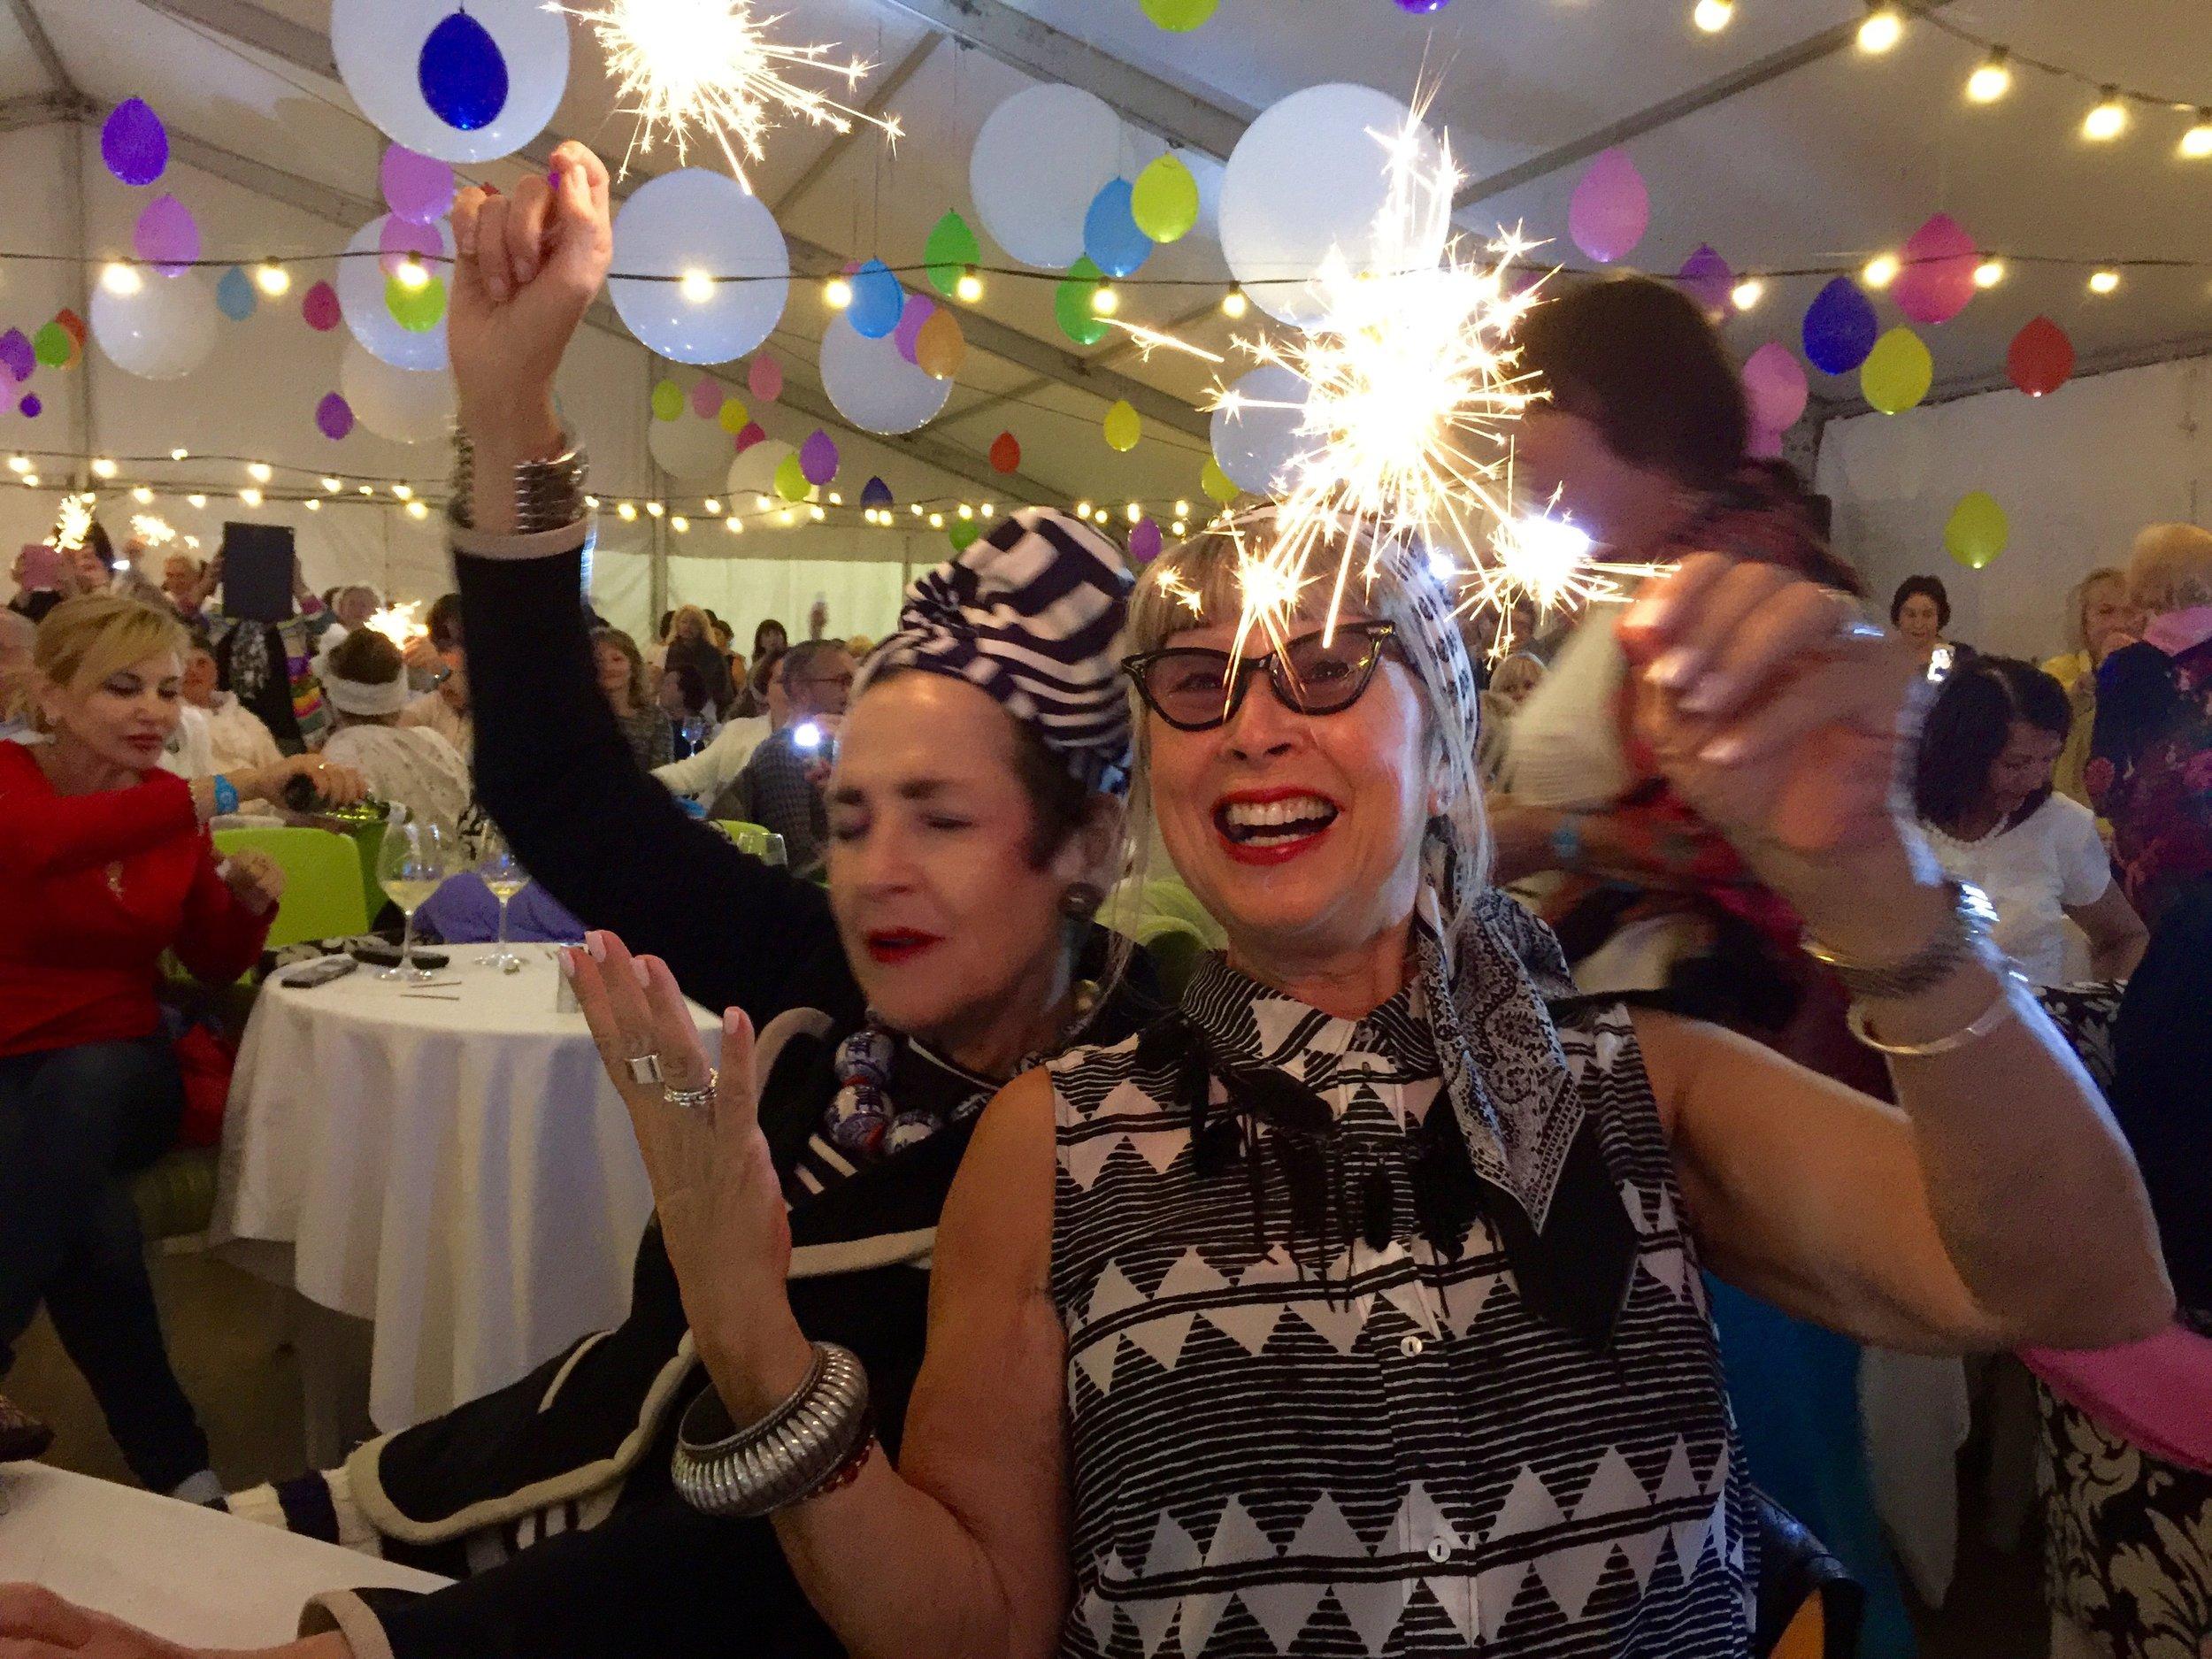 Tziporah Salamon & Alternative Ageing: party time!